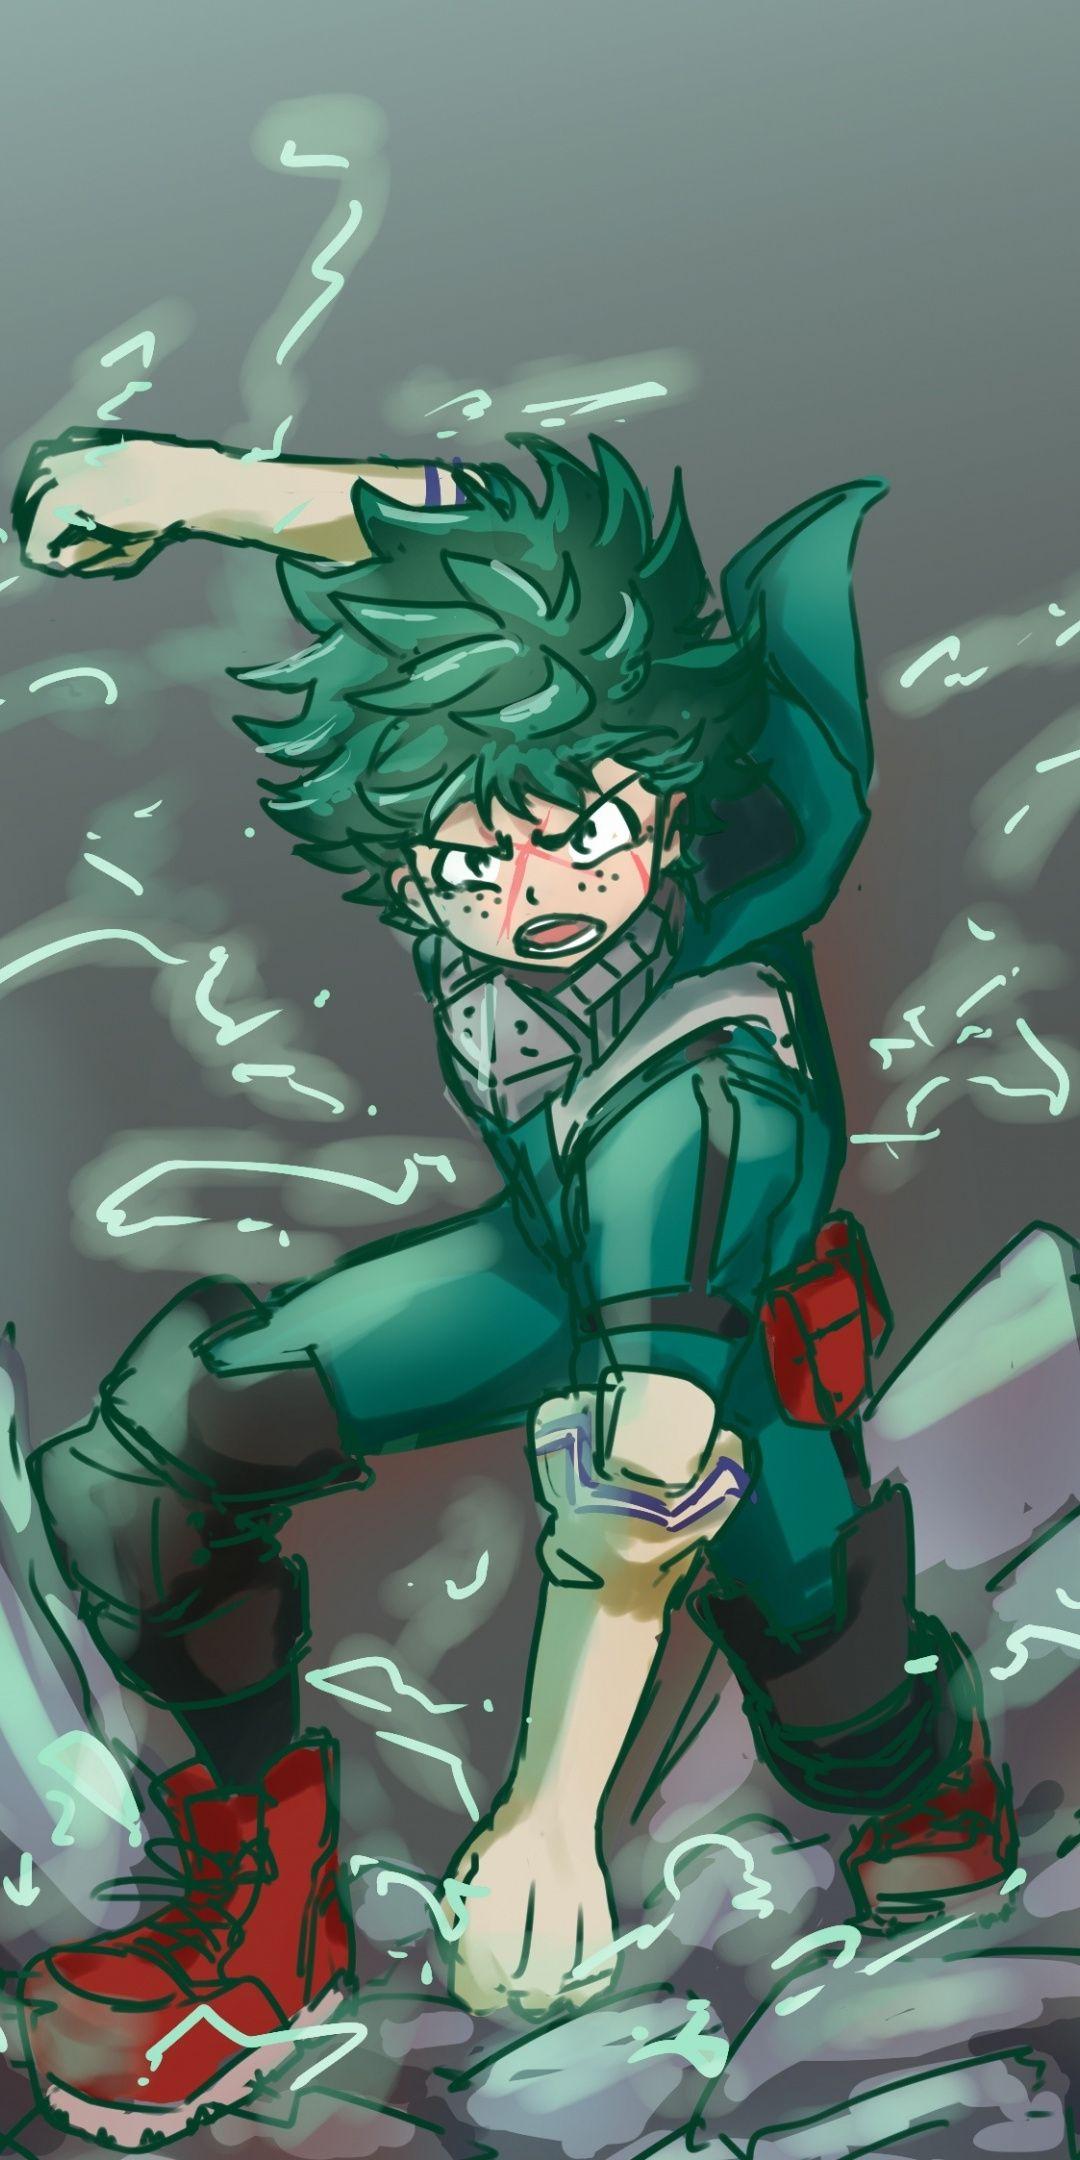 Anime guy with green hair